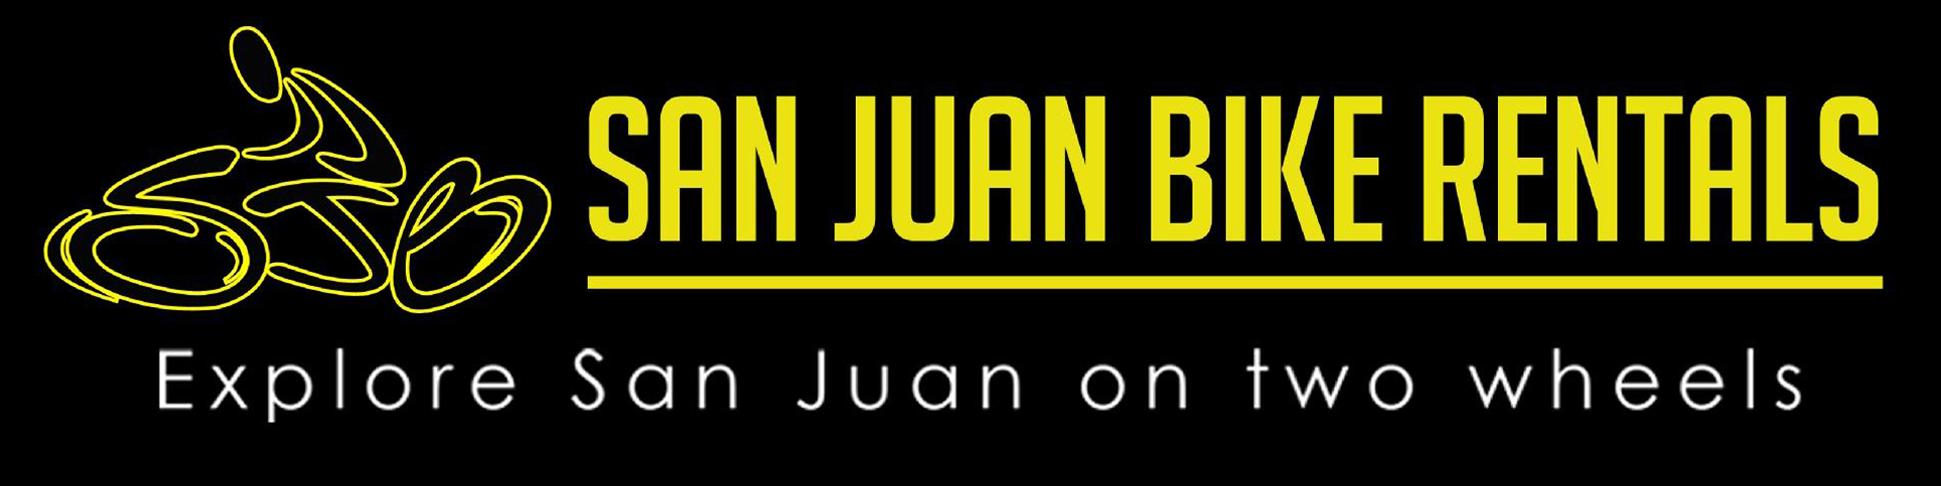 San Juan Bike Rentals LLC